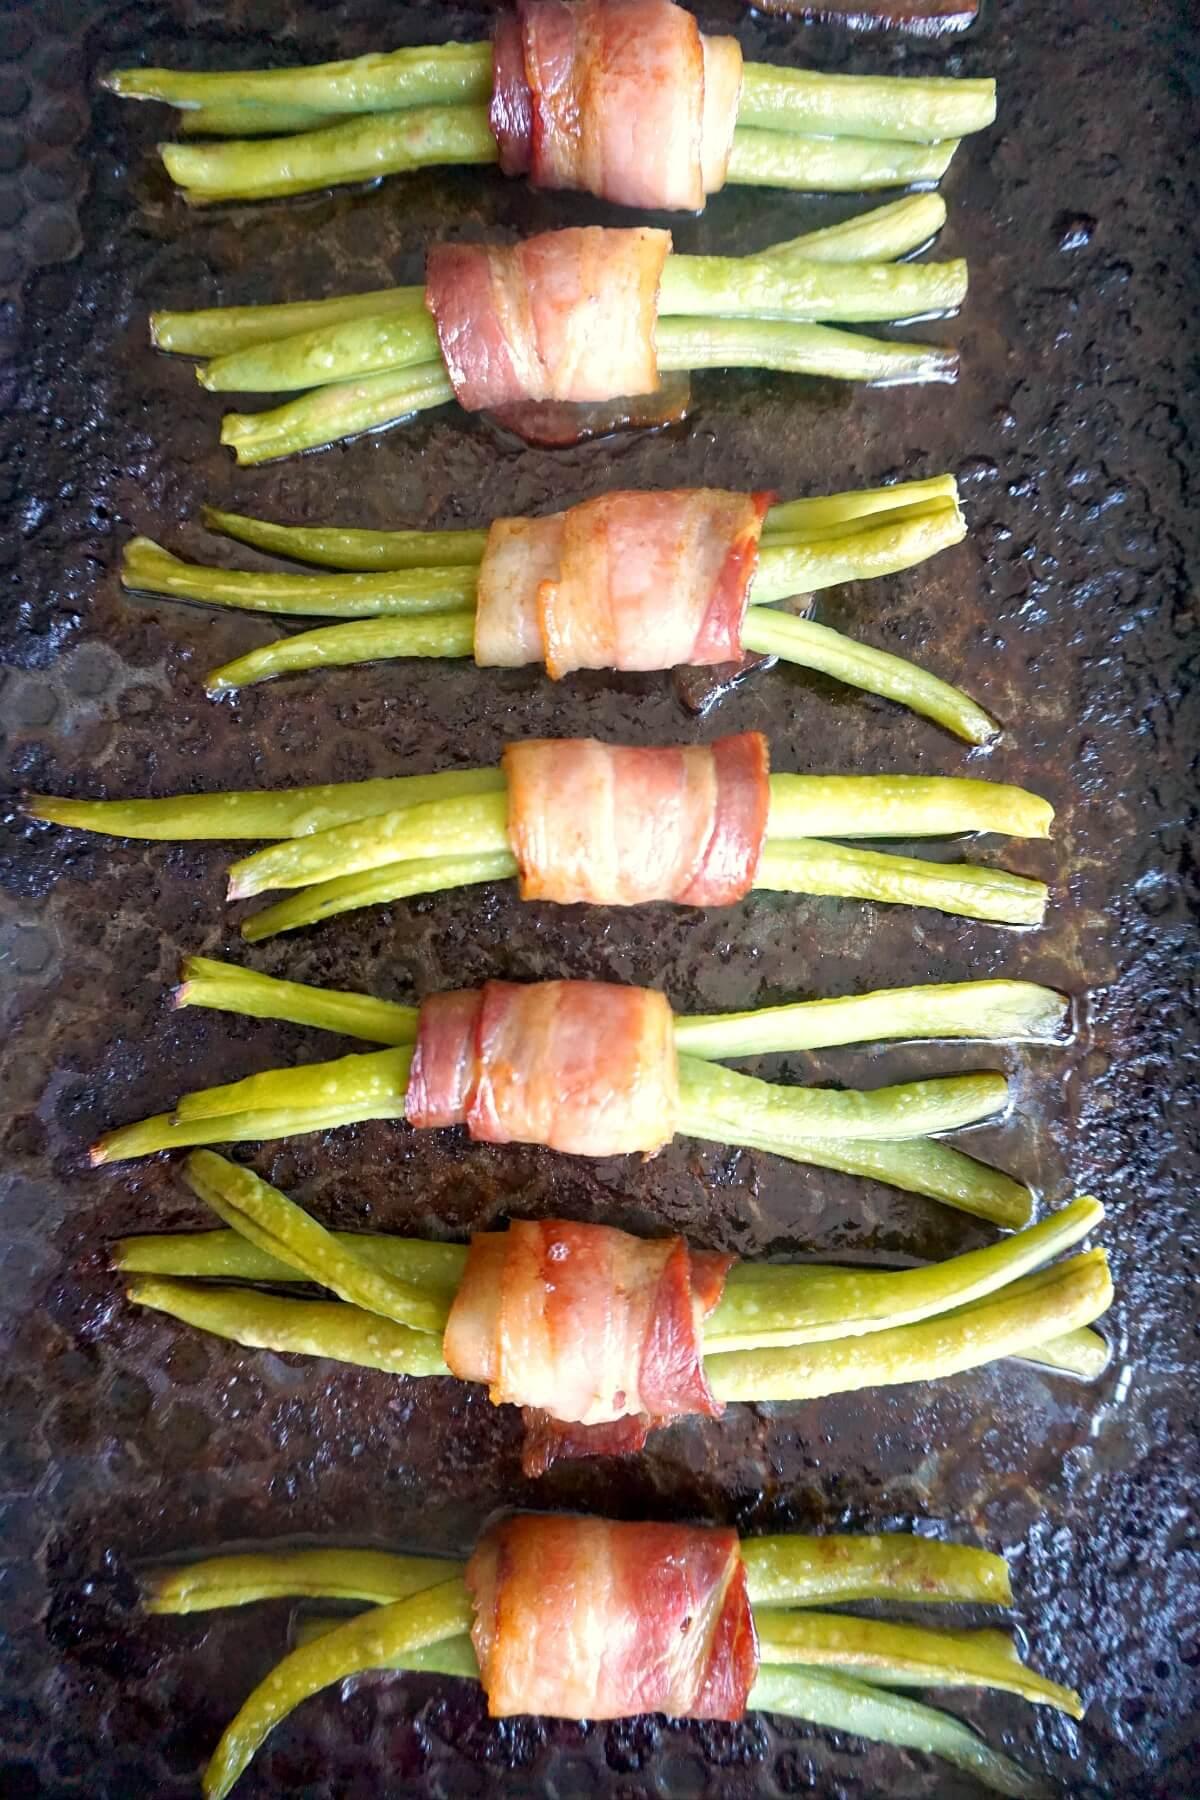 Overhead shoot of 5 green bean bundles in a baking tray